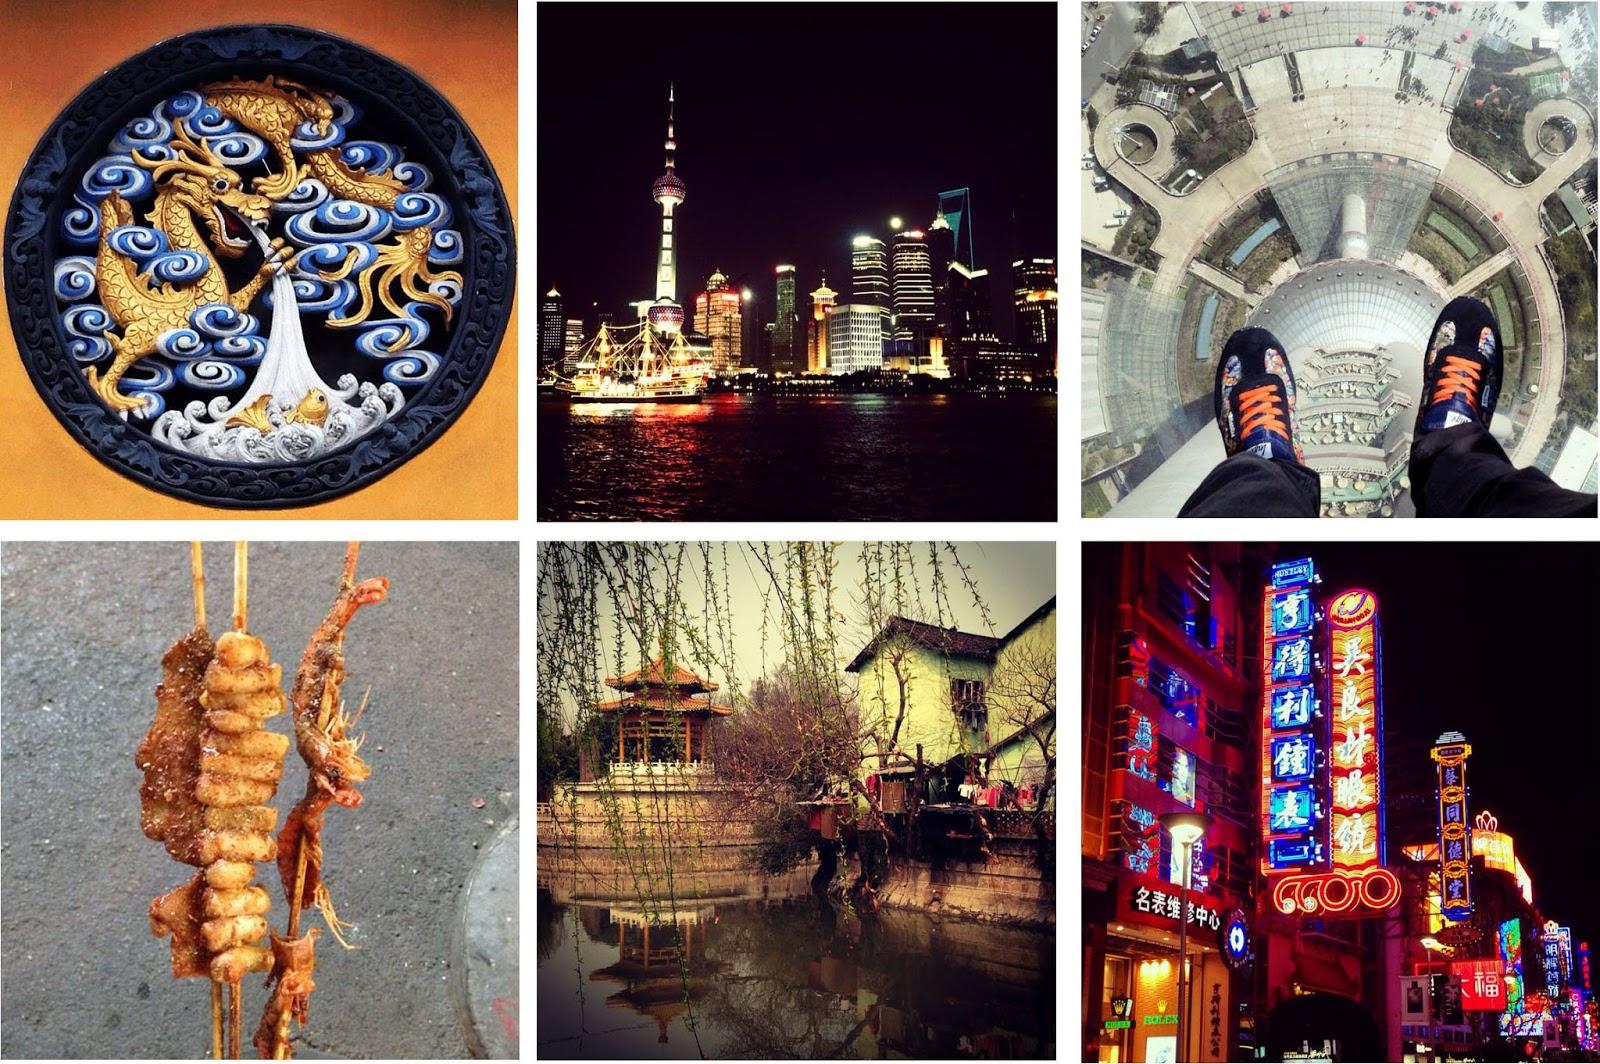 The Beautiful Sighhts of China